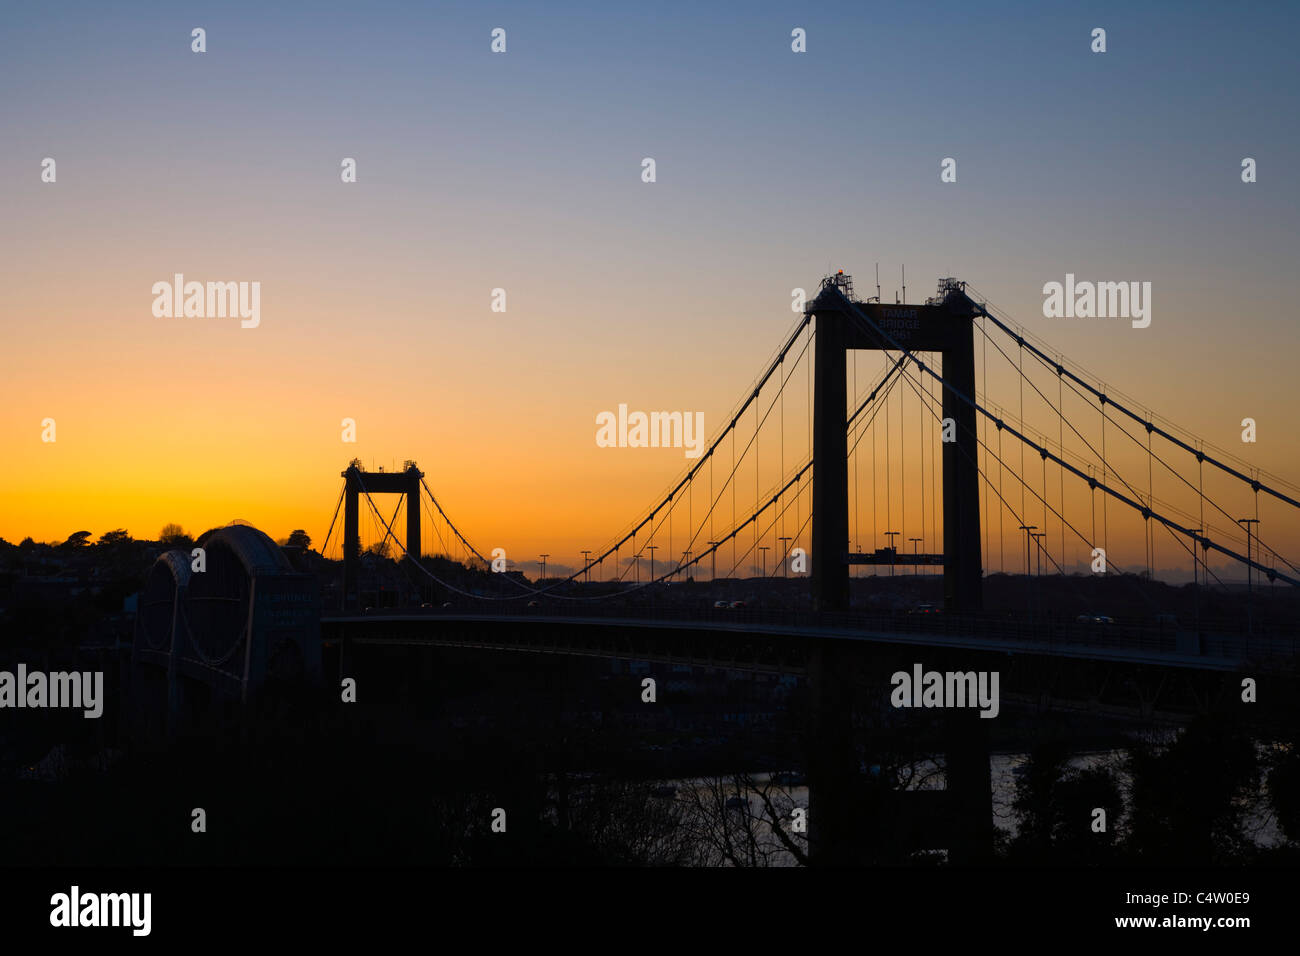 Tamar Bridge, sunset, Plymouth, between Cornwall and Devon, England, UK - Stock Image